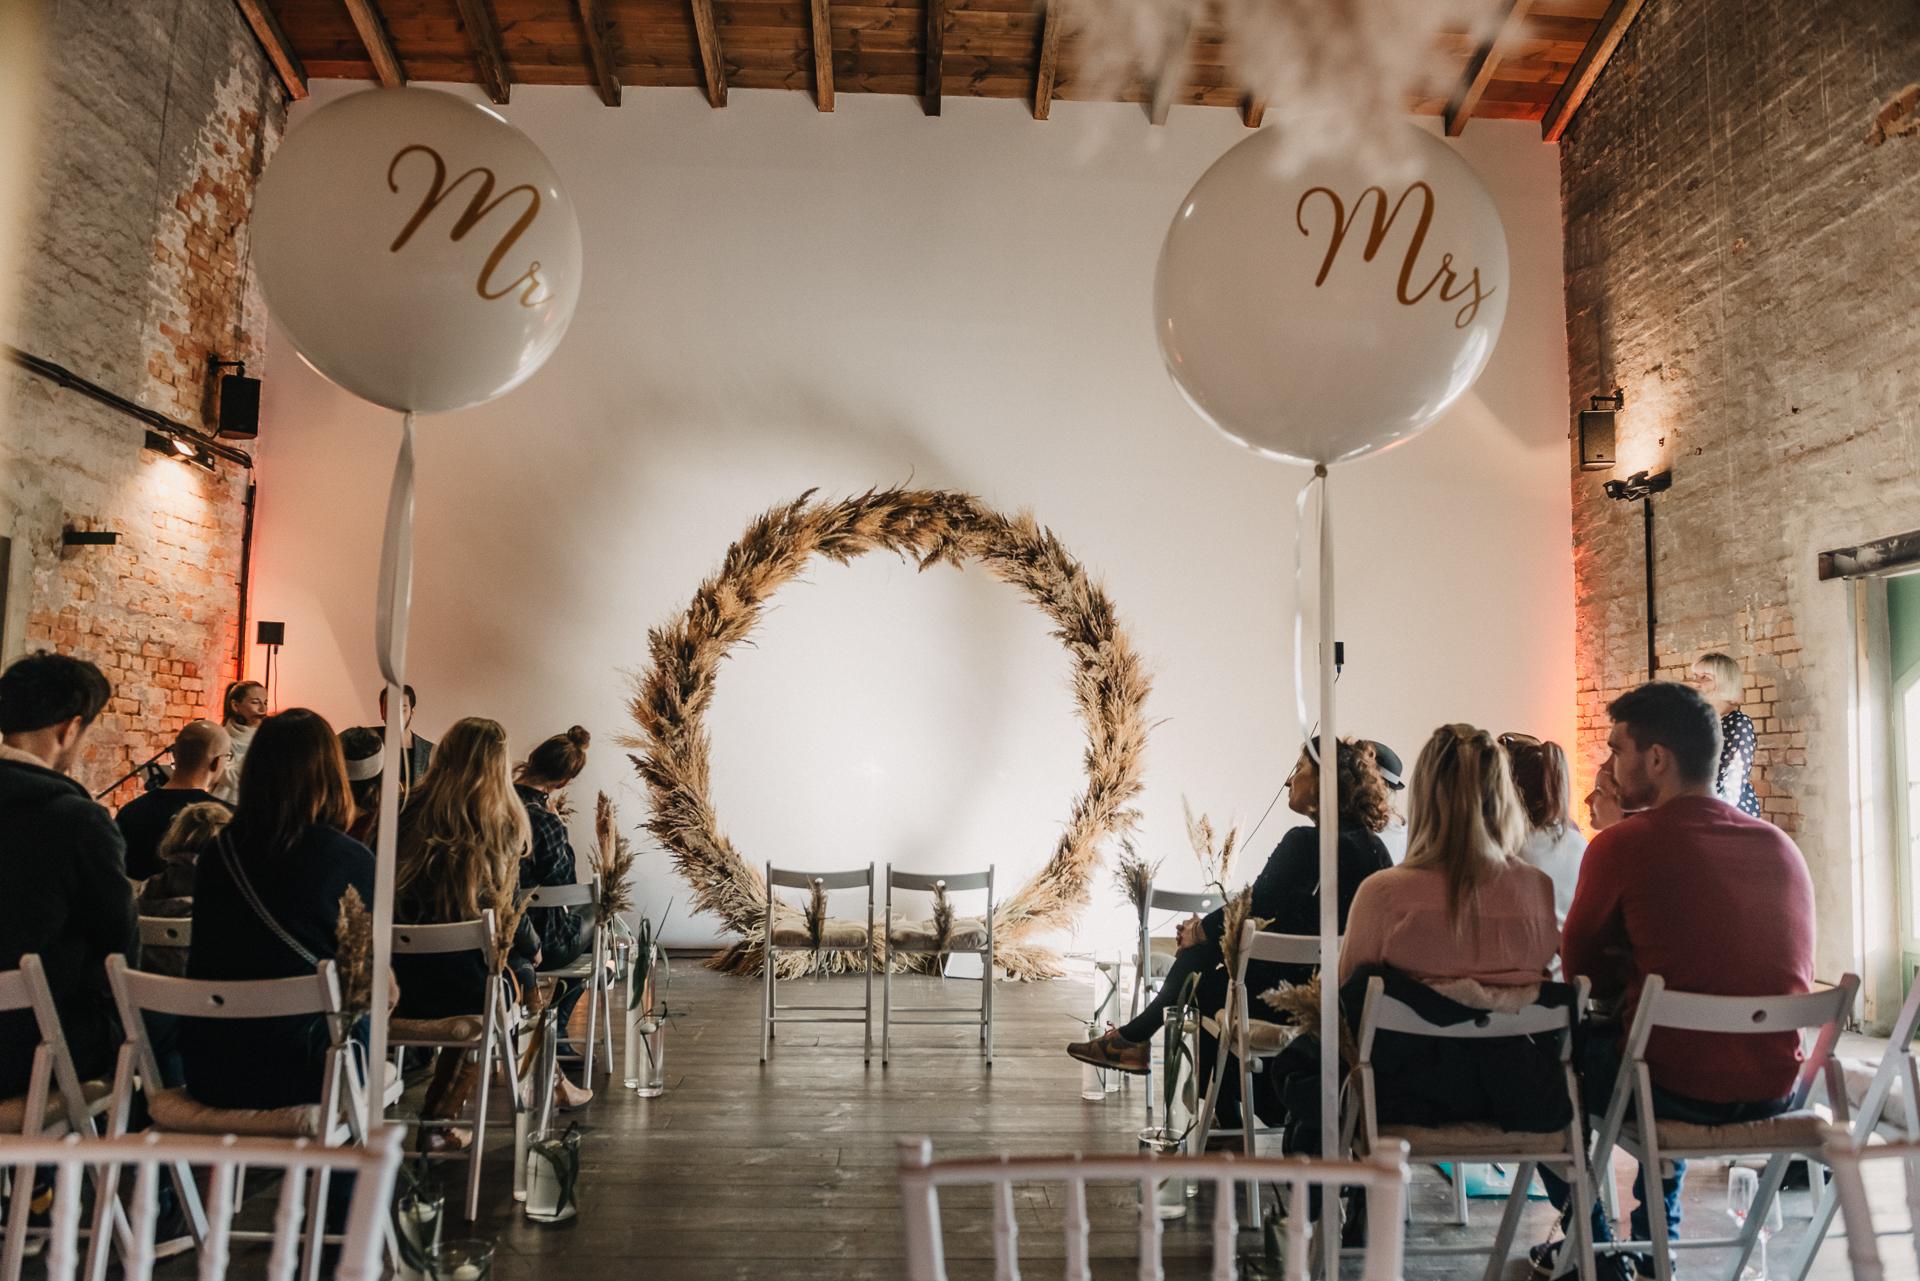 Zweinander-LeonoreHerzog-WeddingMarket-OnTour20191110-9020